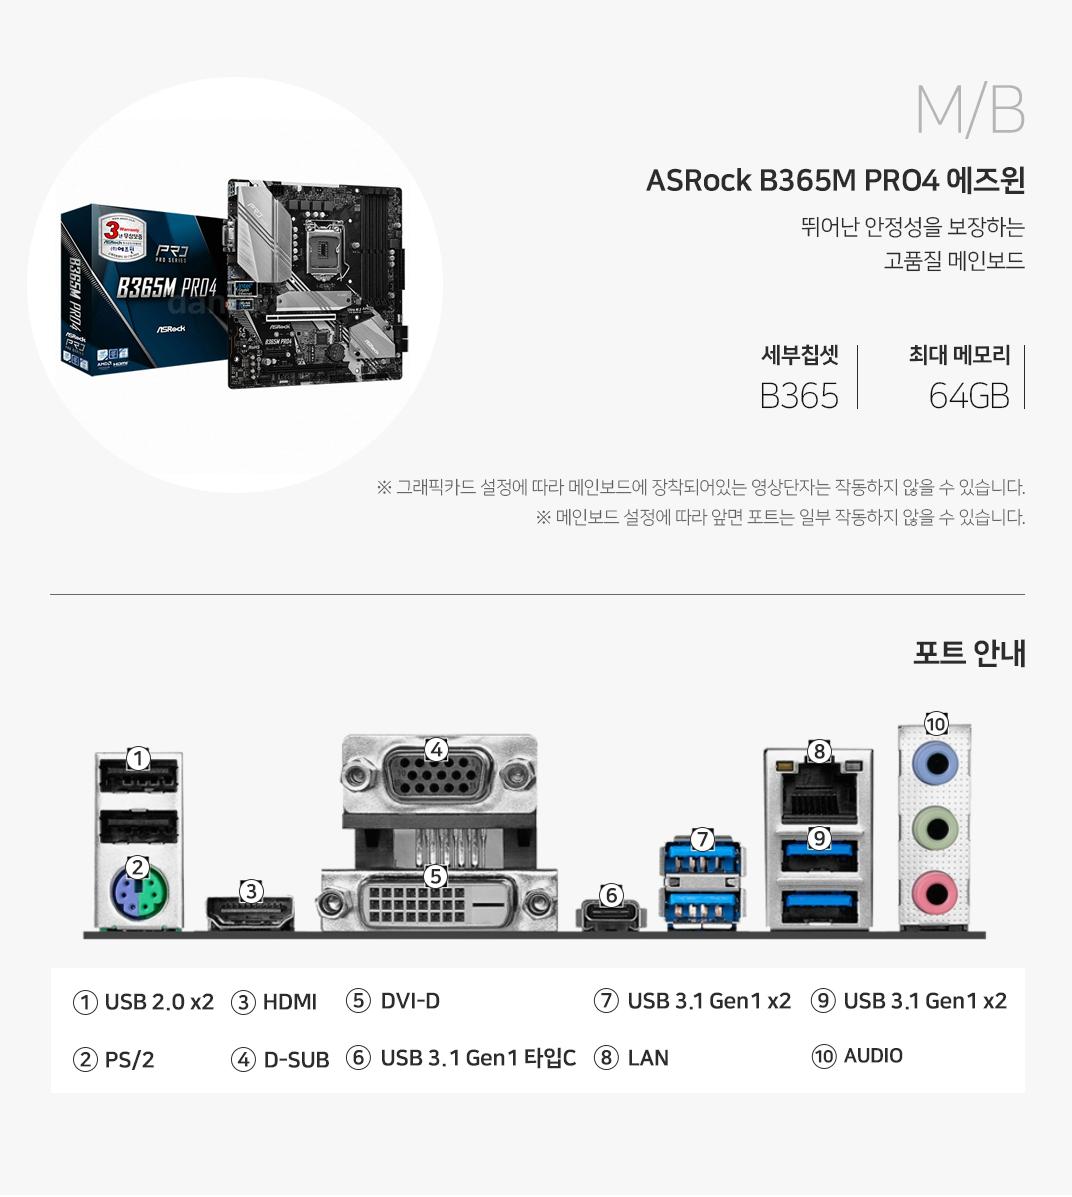 M/B ASRock B365M PRO4 에즈윈 뛰어난 안정성을 보장하는 고품질 메인보드 세부칩셋 H310 최대메모리 32GB 그래픽 설정에 따라 메인보드에 장착되어 있는 영상단자는 작동하지 않을 수 있습니다. 메인보드 설정에 따라 앞면 포트는 일부 작동하지 않을 수 있습니다.